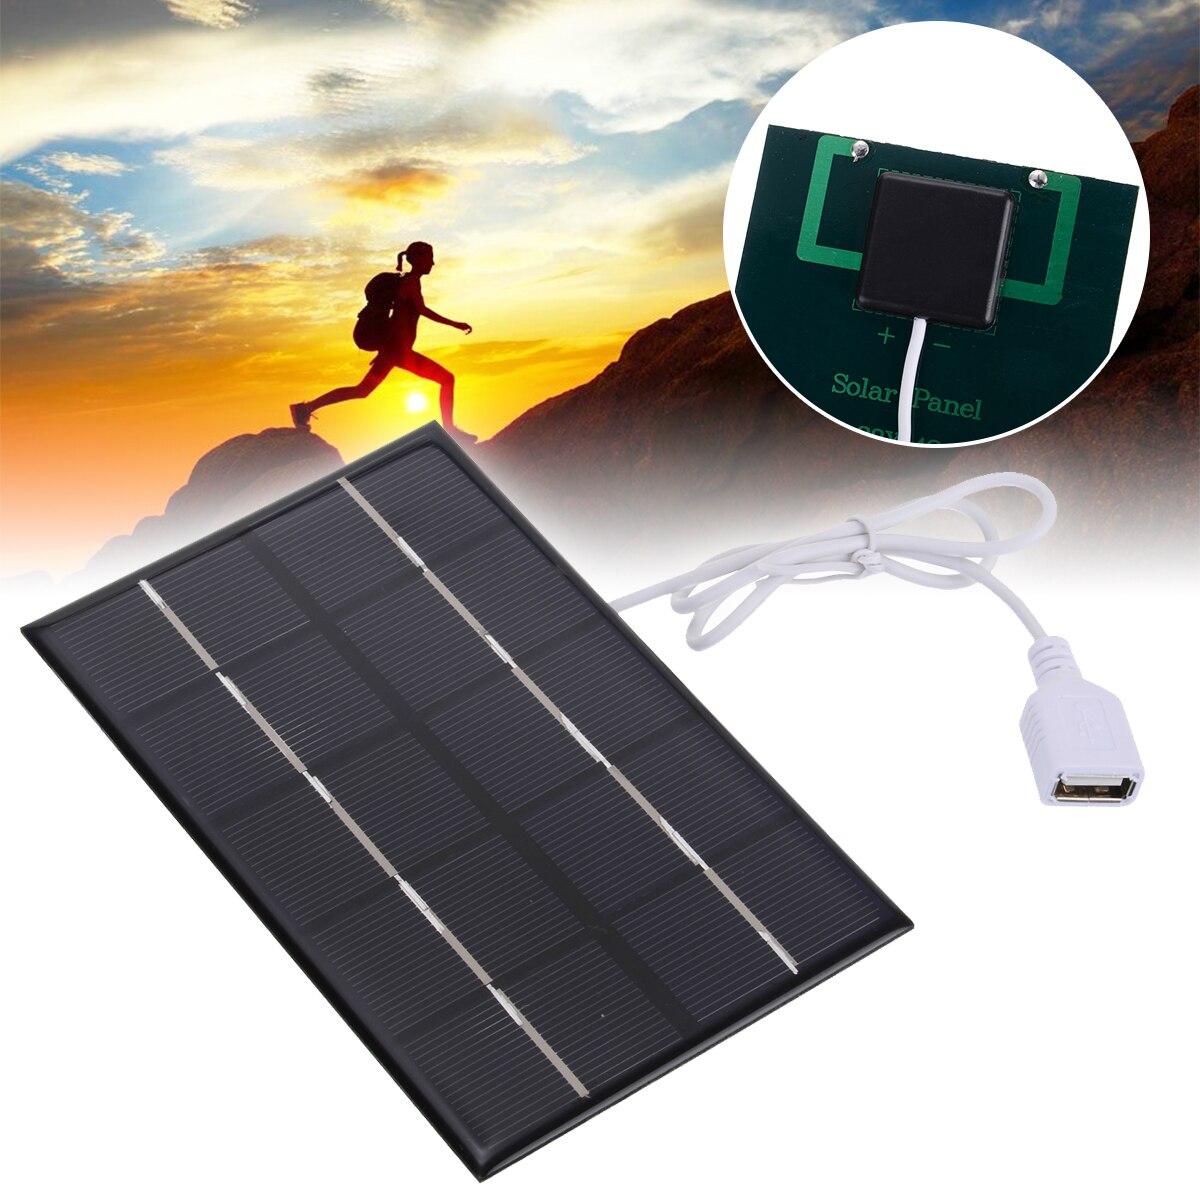 5W 5V Mayitr Portable USB Solar Panel Charger Pane USB Port Mobile Phone Travel Solar Panel